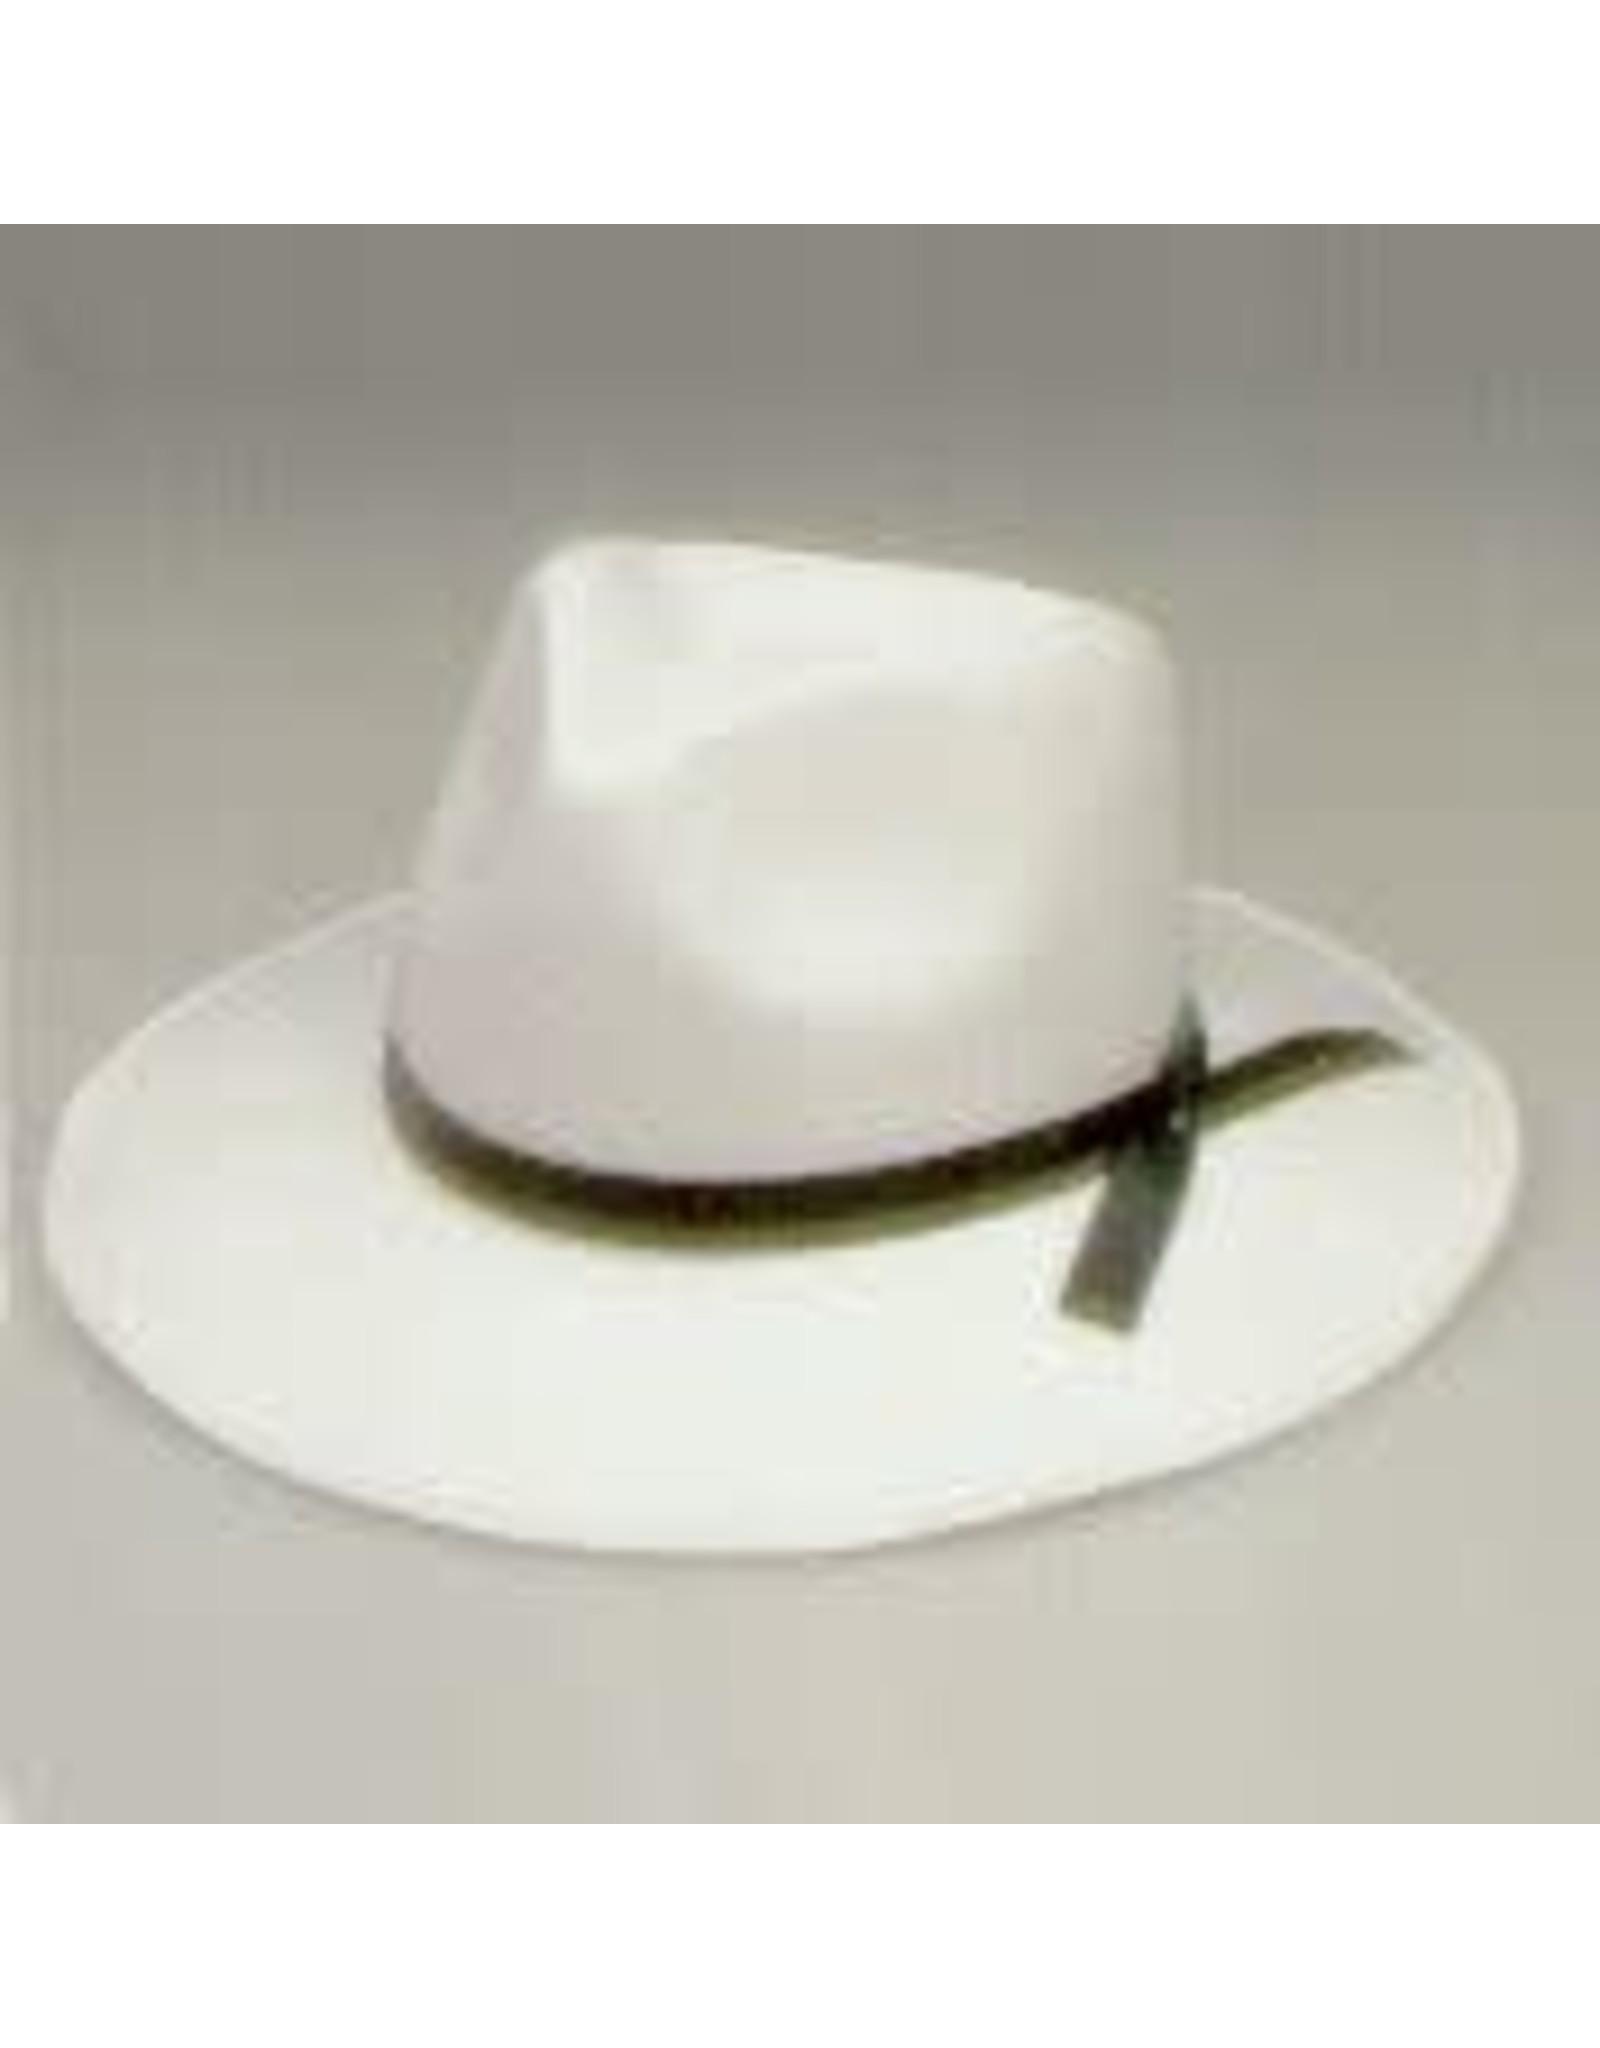 SKS Novelty Permafelt Gangster Hat White